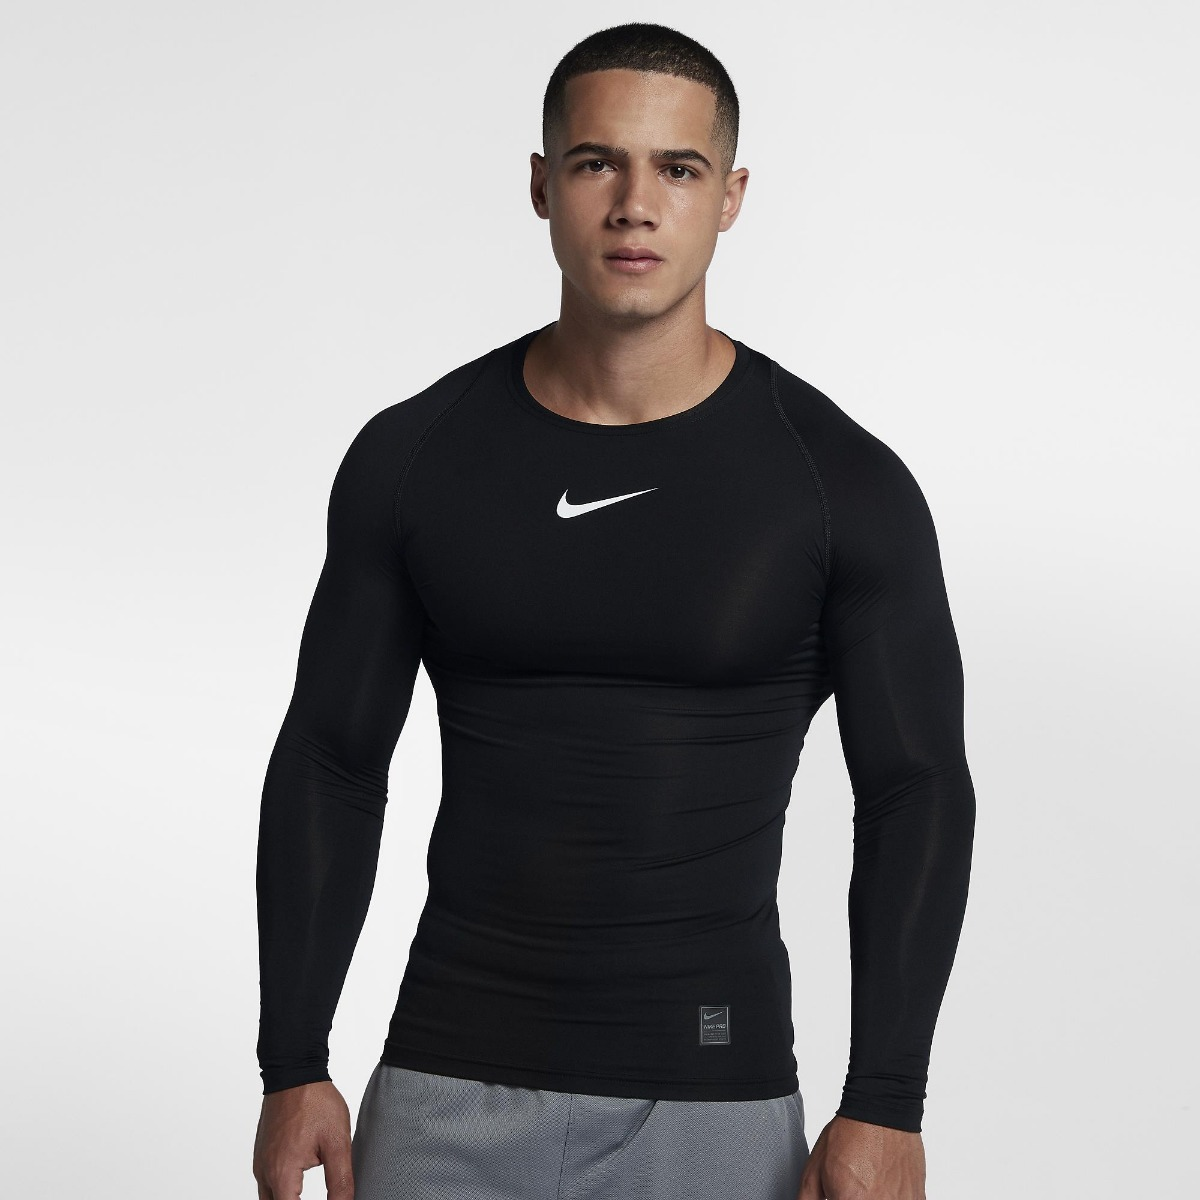 61ab4271e3 camiseta térmica nike pro top compression masculina(dpluvas). Carregando  zoom.